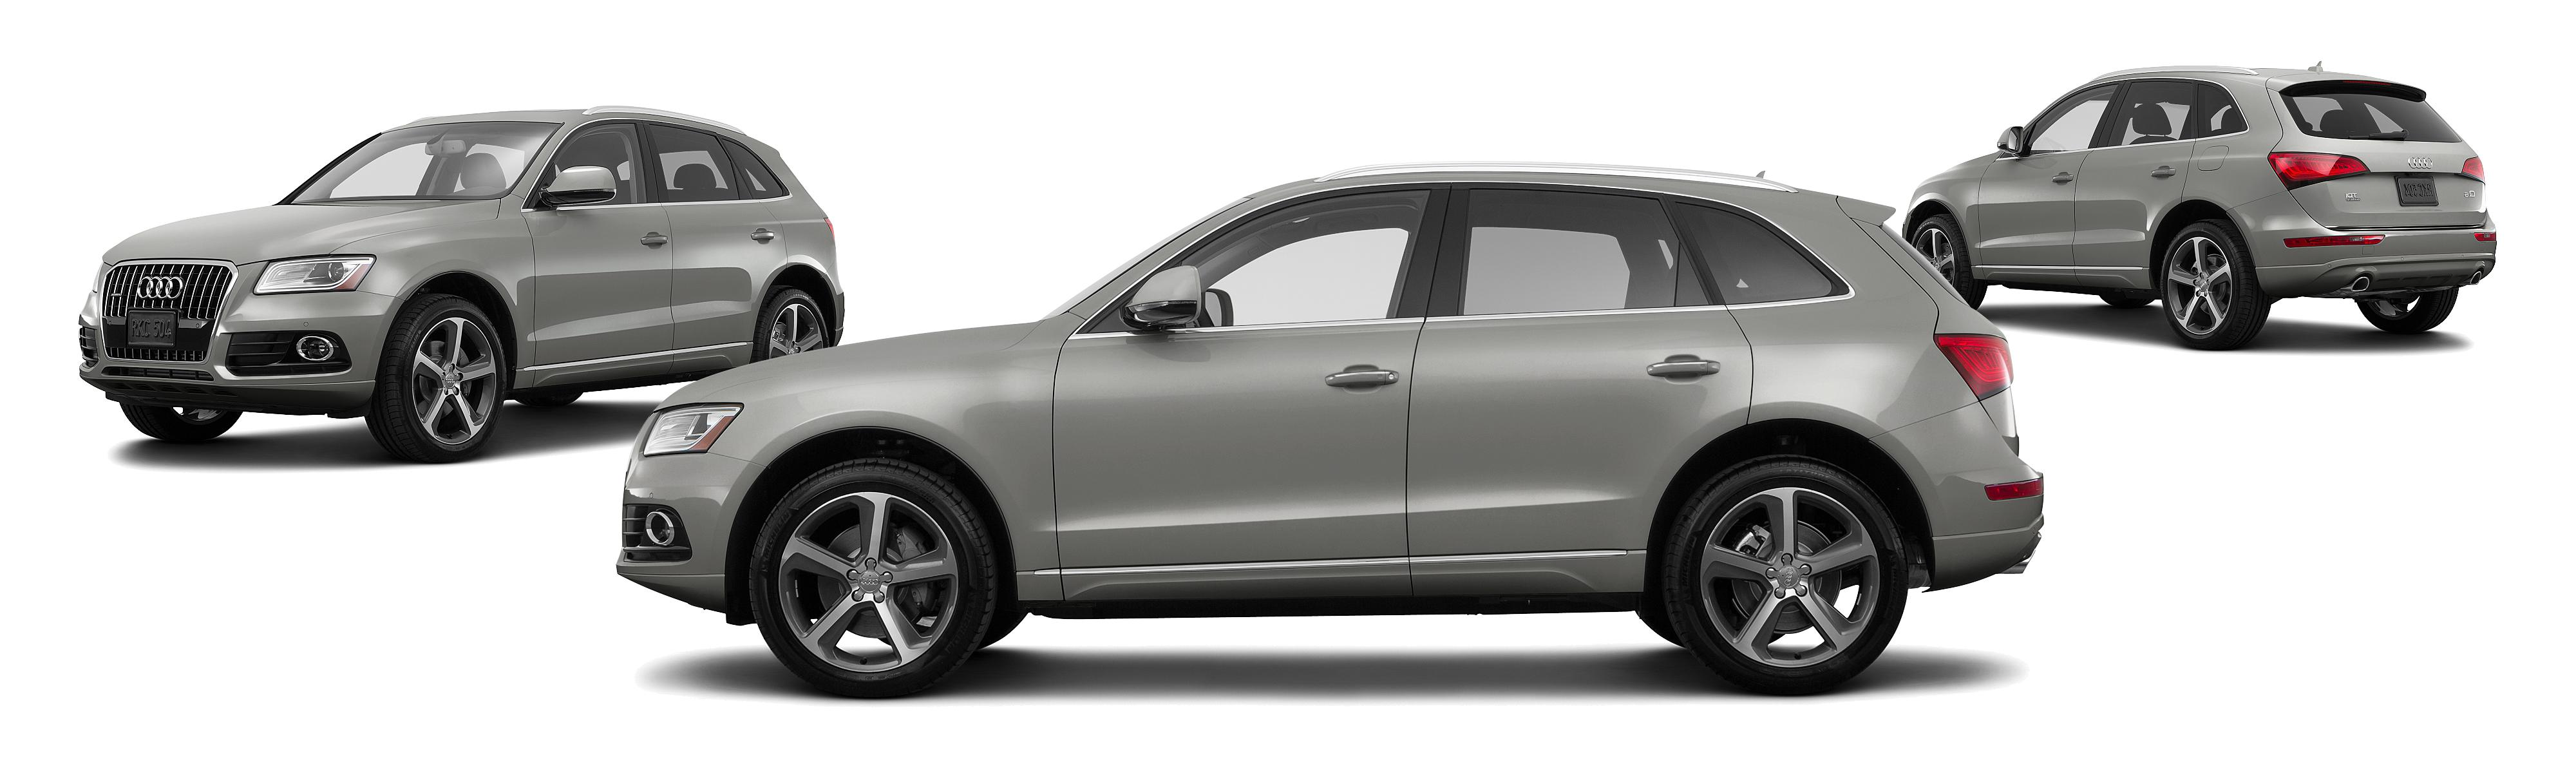 2016 Audi Q5 Hybrid Awd 2 0t Quattro Prestige 4dr Suv Research Groovecar